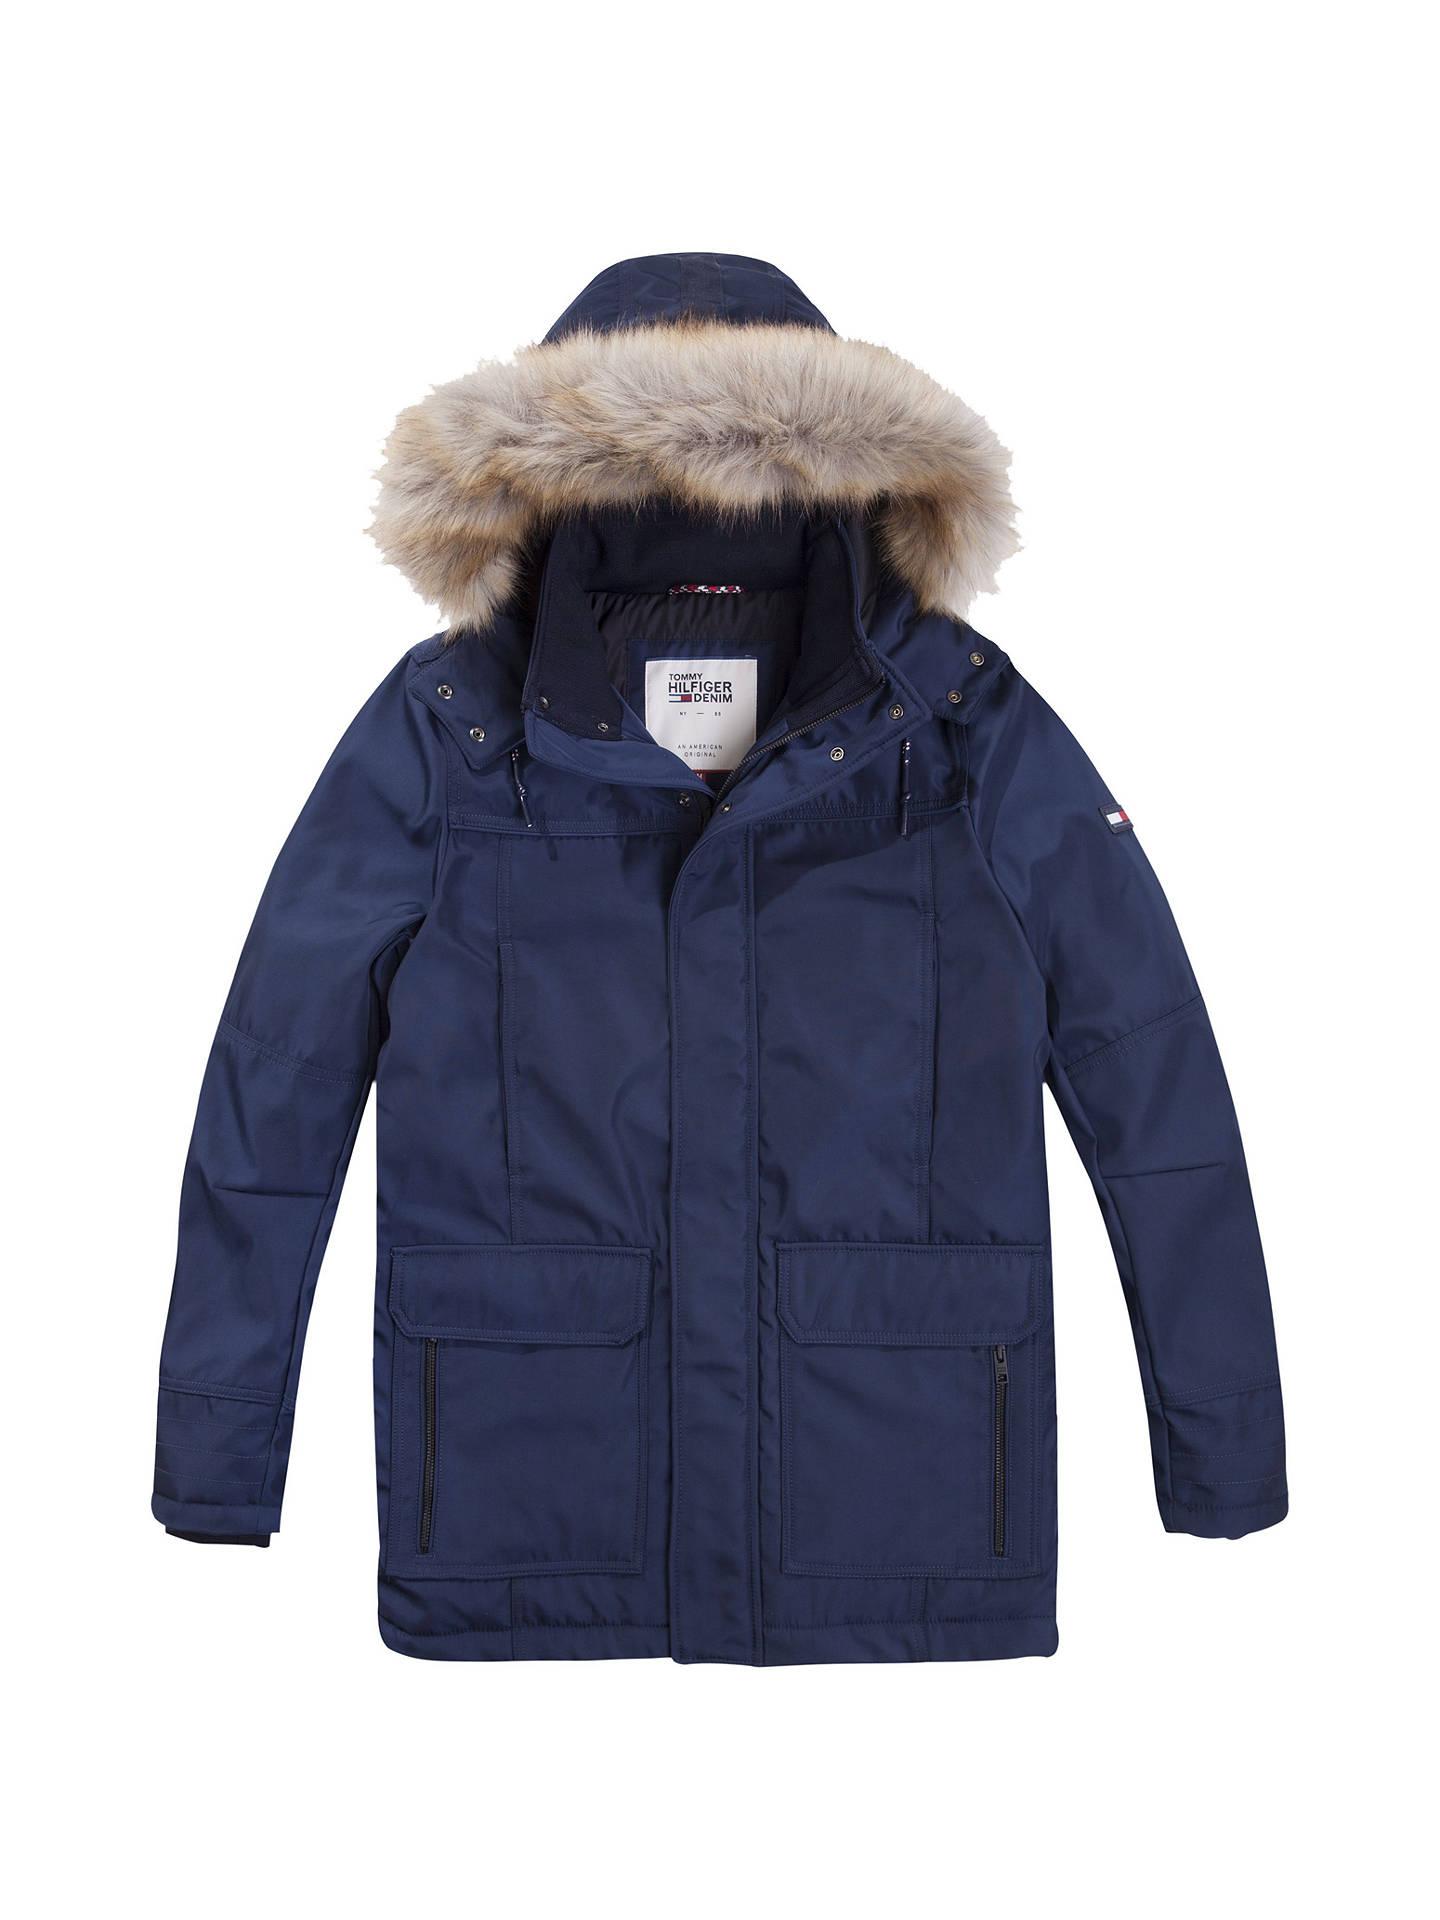 09201b02 Buy Tommy Jeans Tech Parka Jacket, Multi/Navy, S Online at johnlewis.